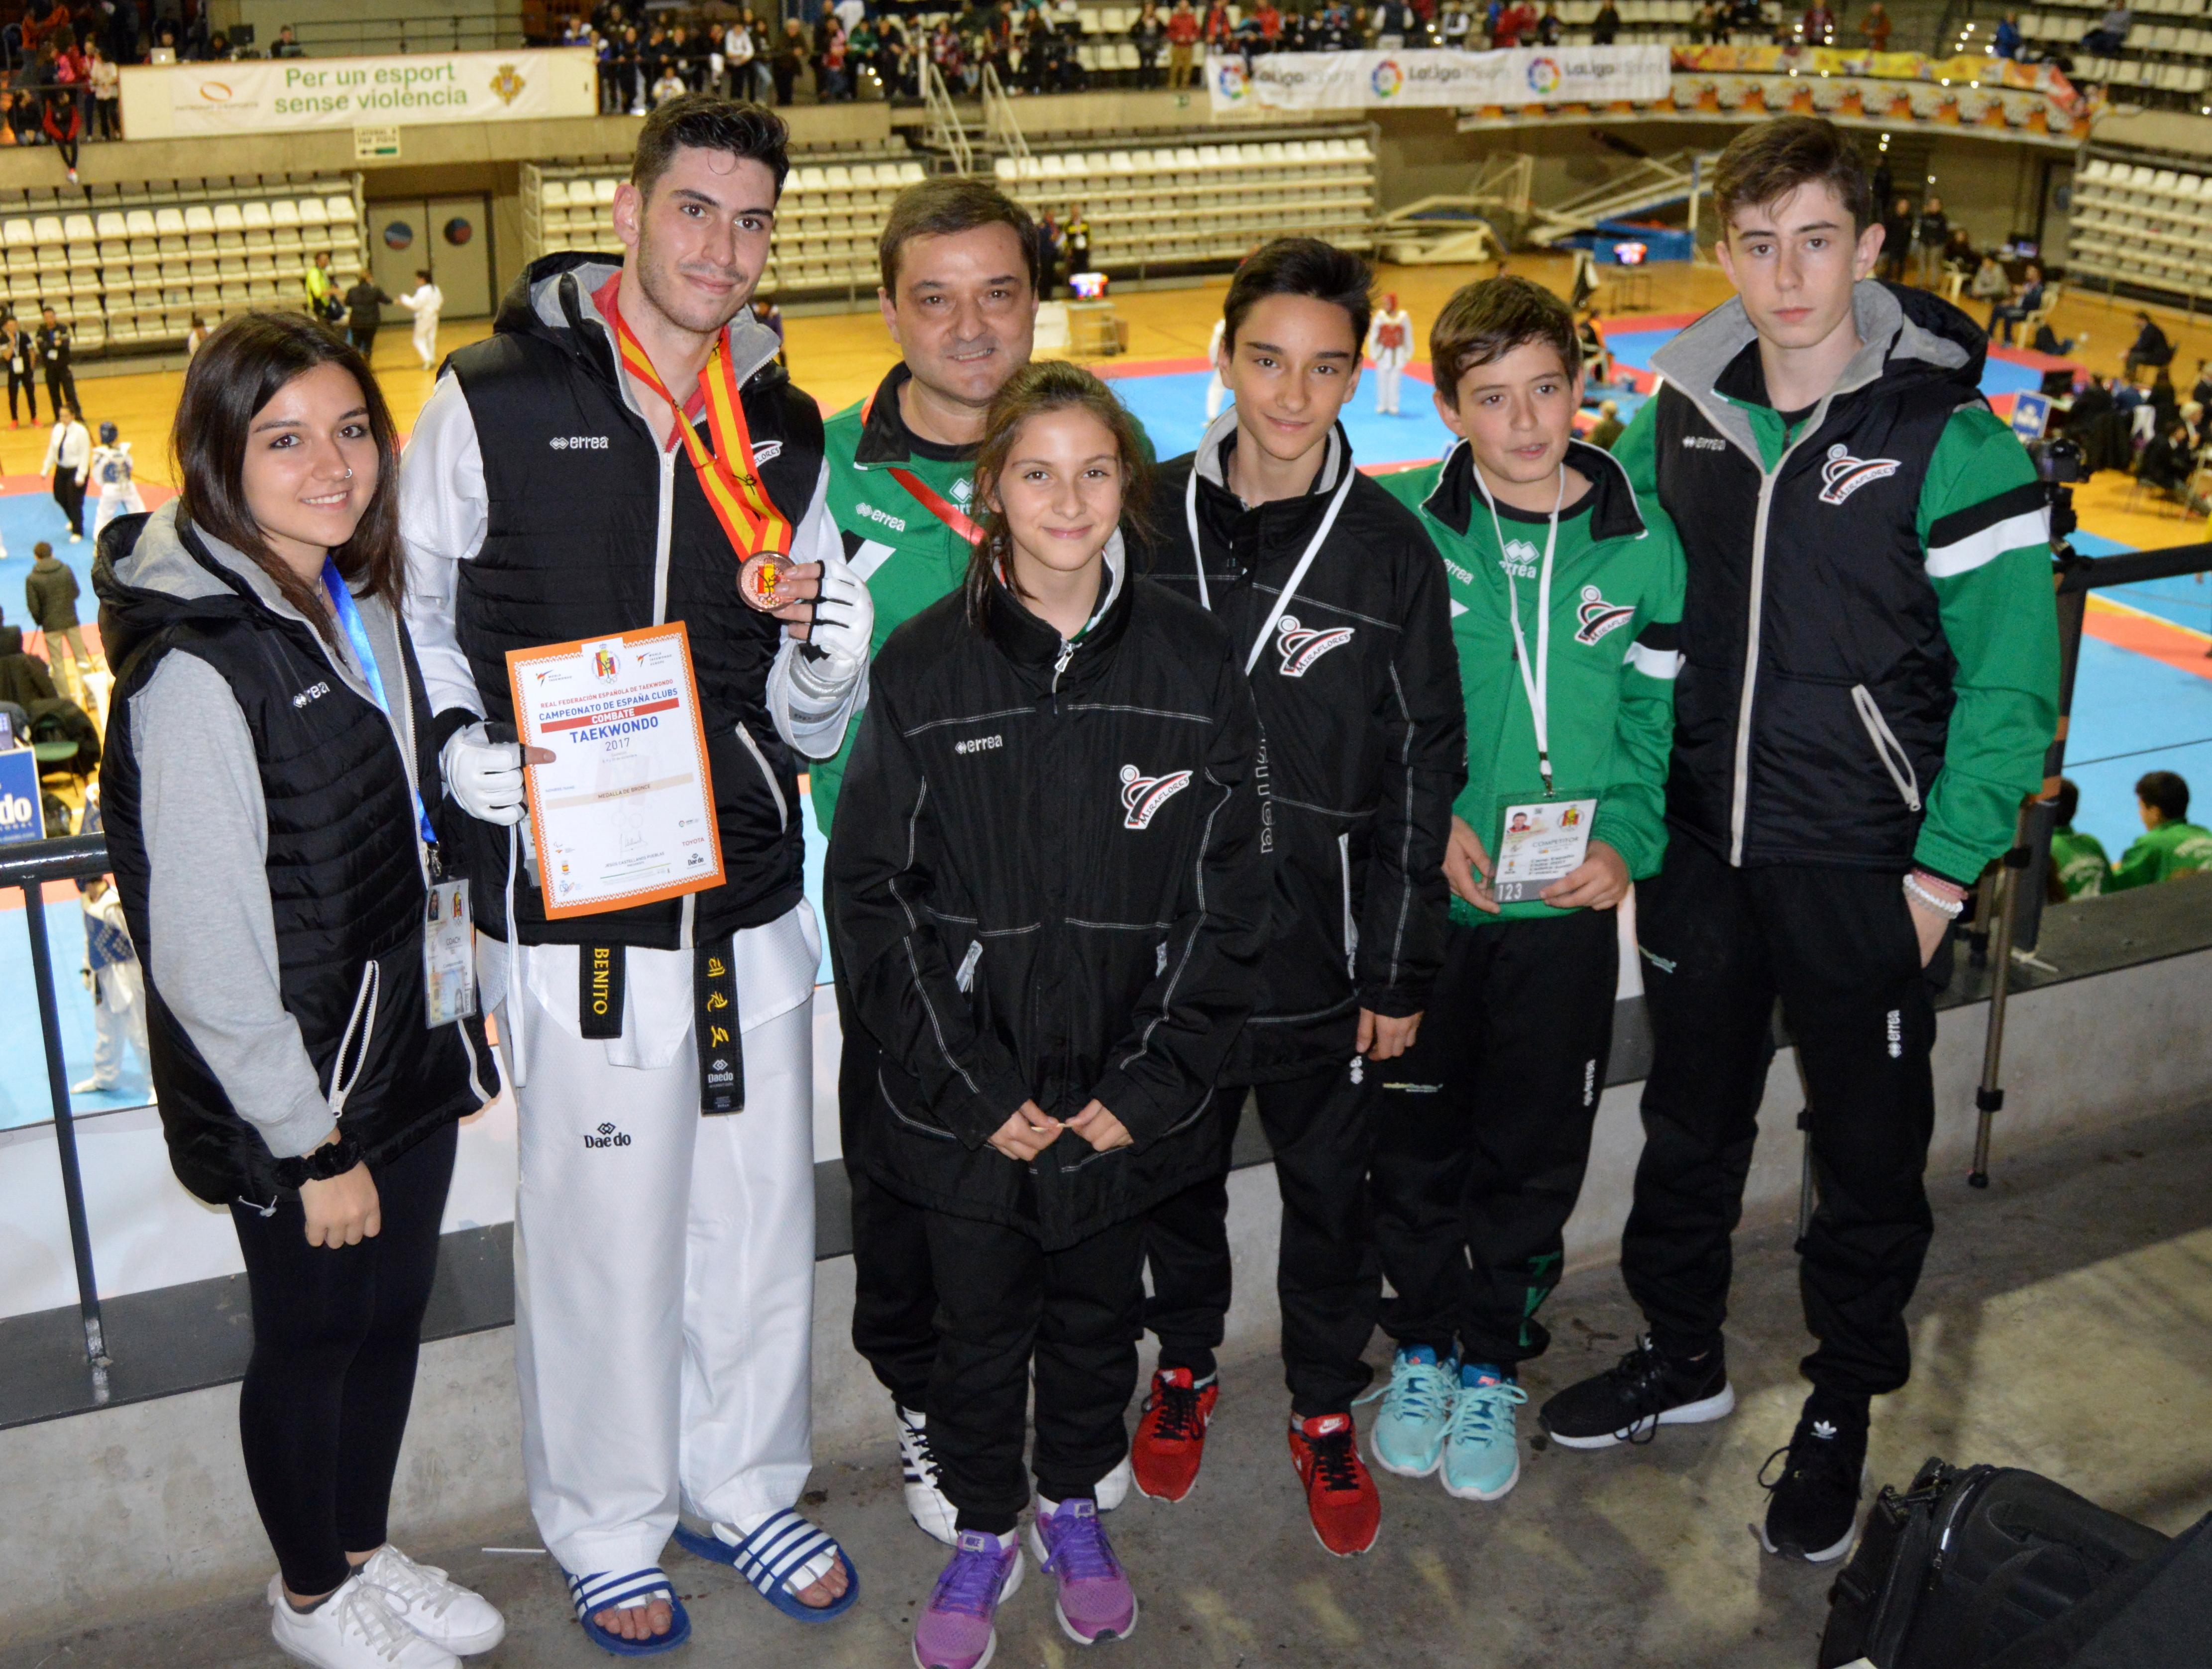 Crónica del Fin de Semana: Club deportivo Taekwondo Miraflores – Bekdoosan